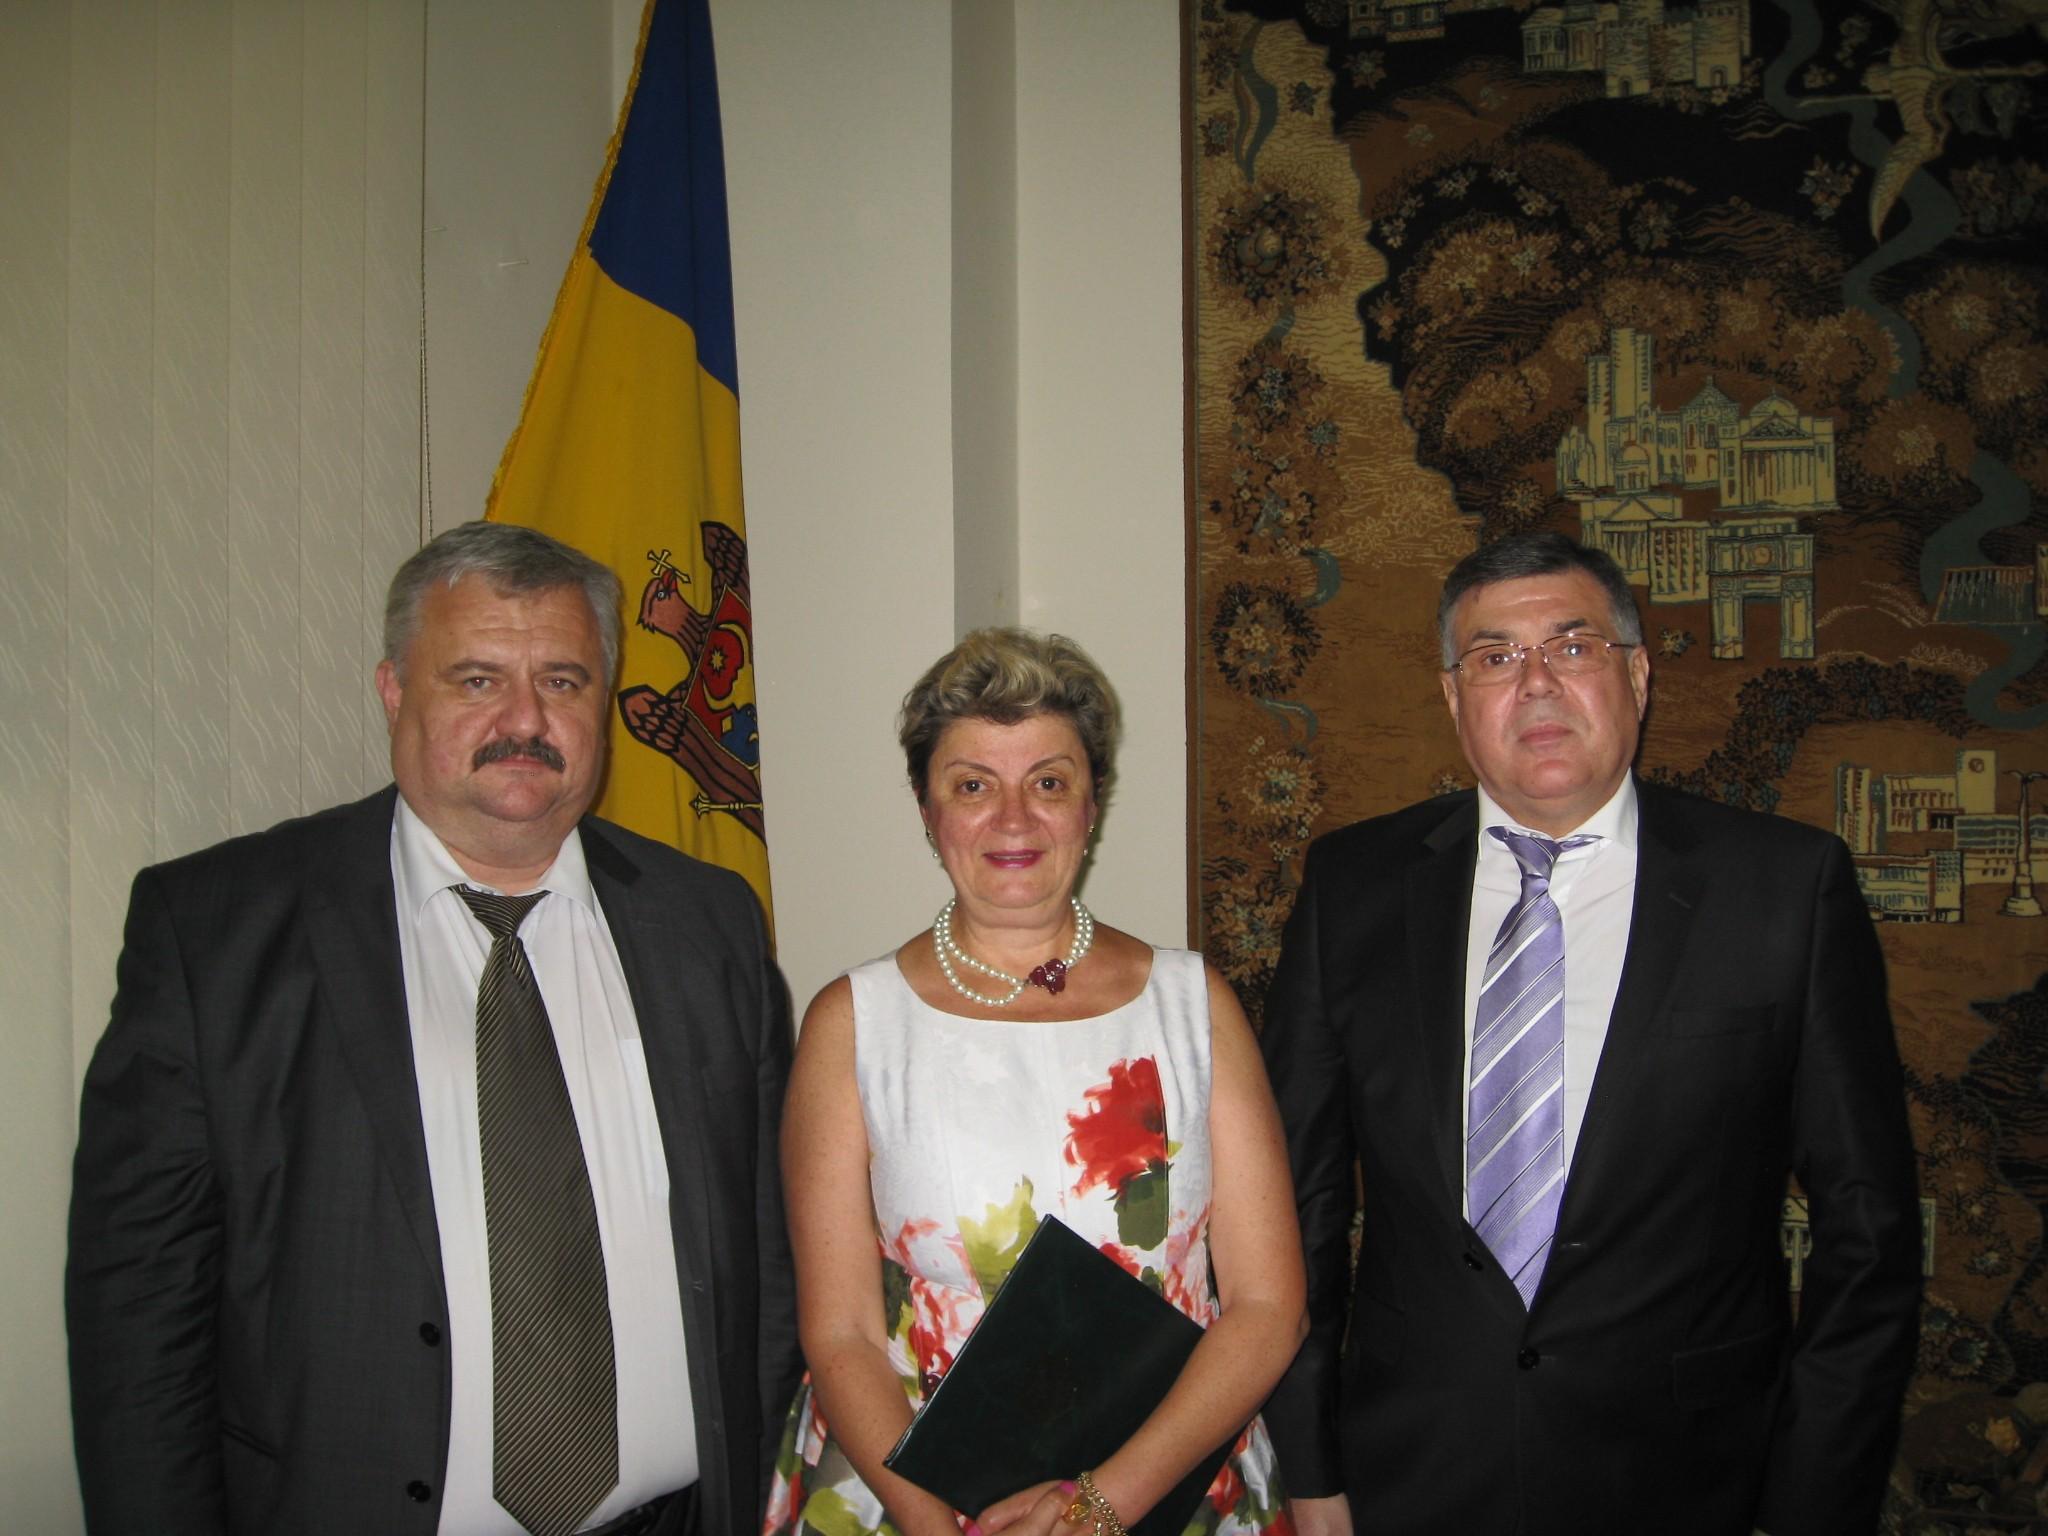 Anghelescu Receives Award